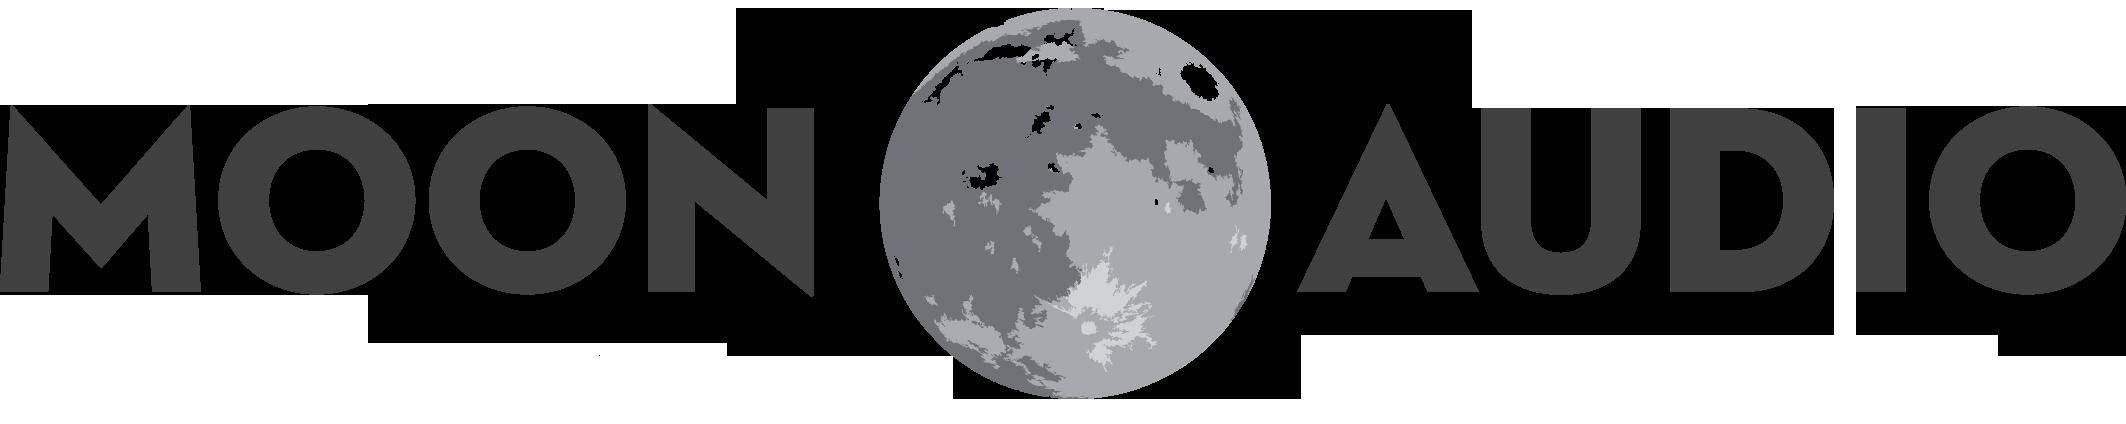 moon_audio_logo no tag